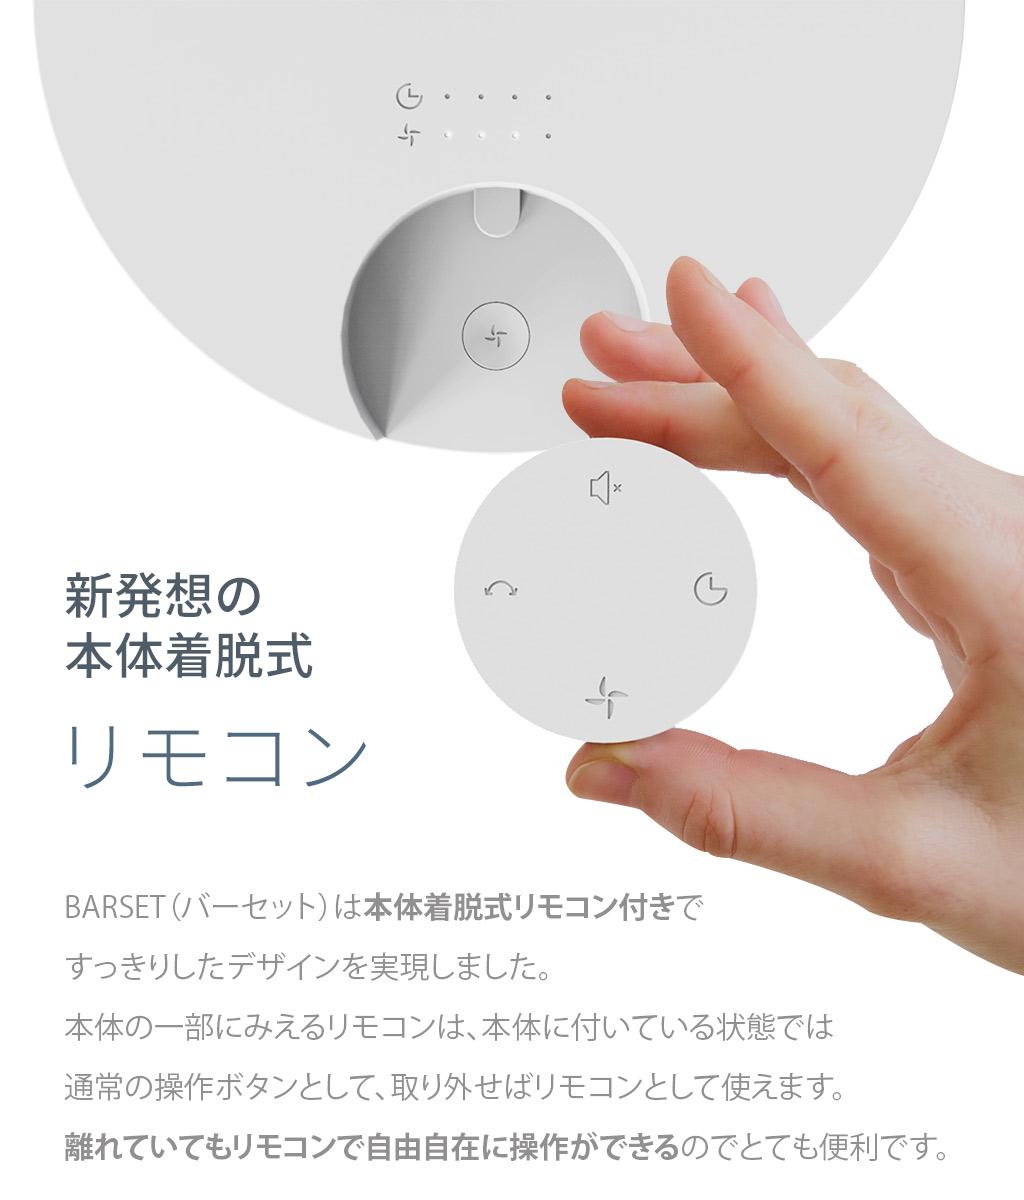 BLUEFEEL BARSET 4D FAN コードレス卓上扇風機 USB Type-C 充電式 首振り タイマー